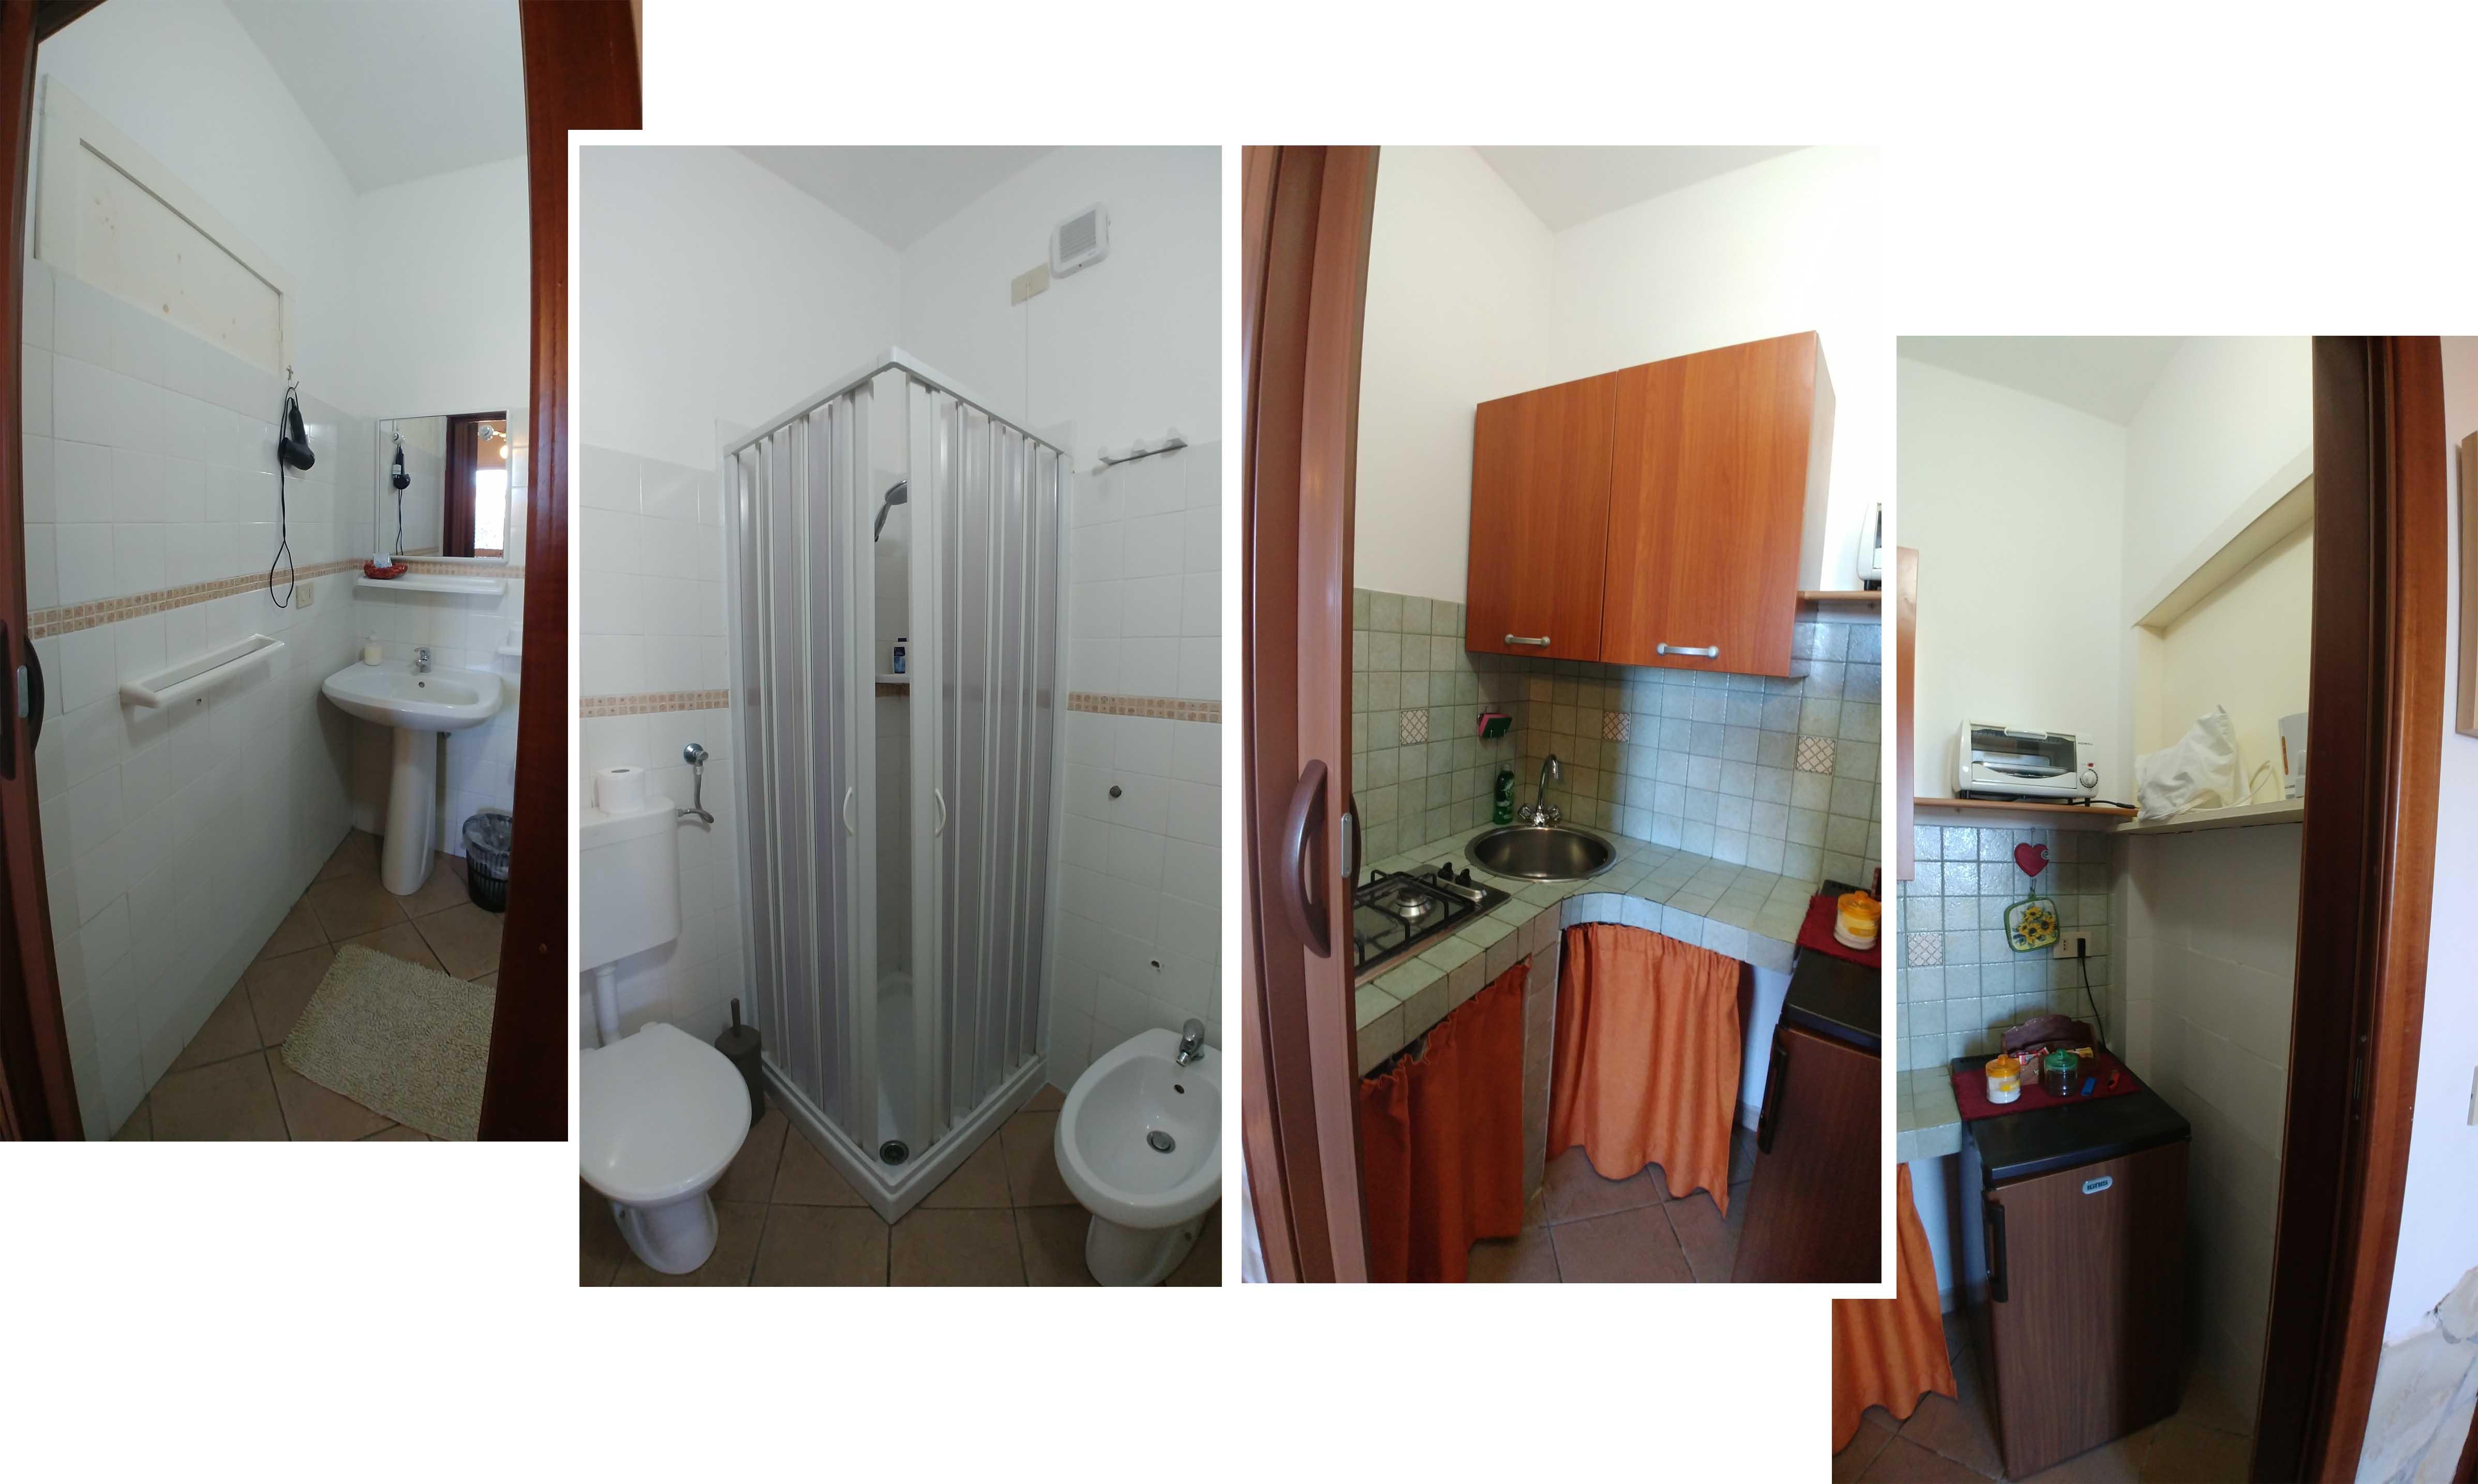 Toilet and kitchen